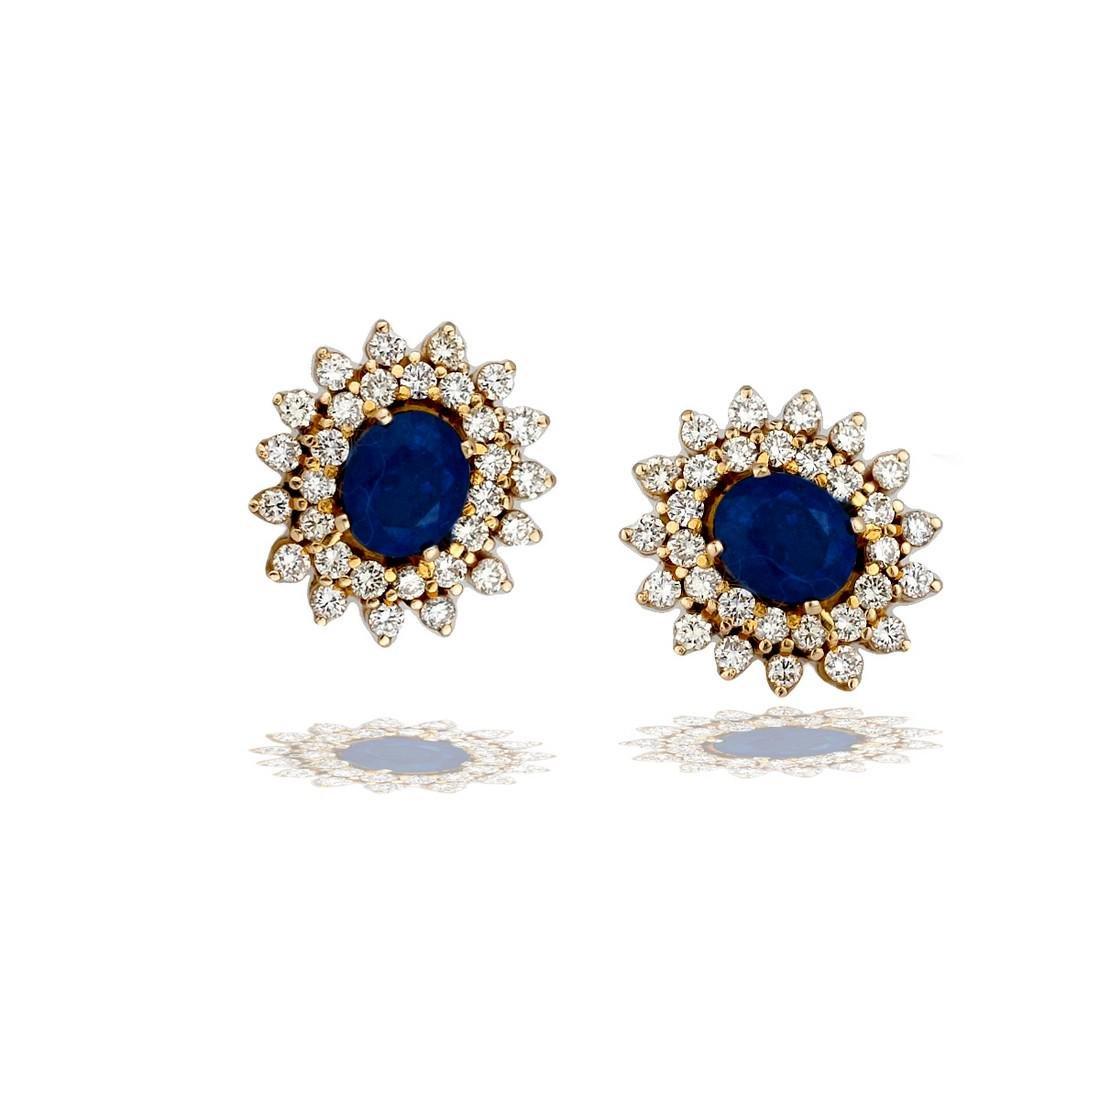 Double, 3.00 TCW Diamond Halo & Sapphire Stud Earrings,